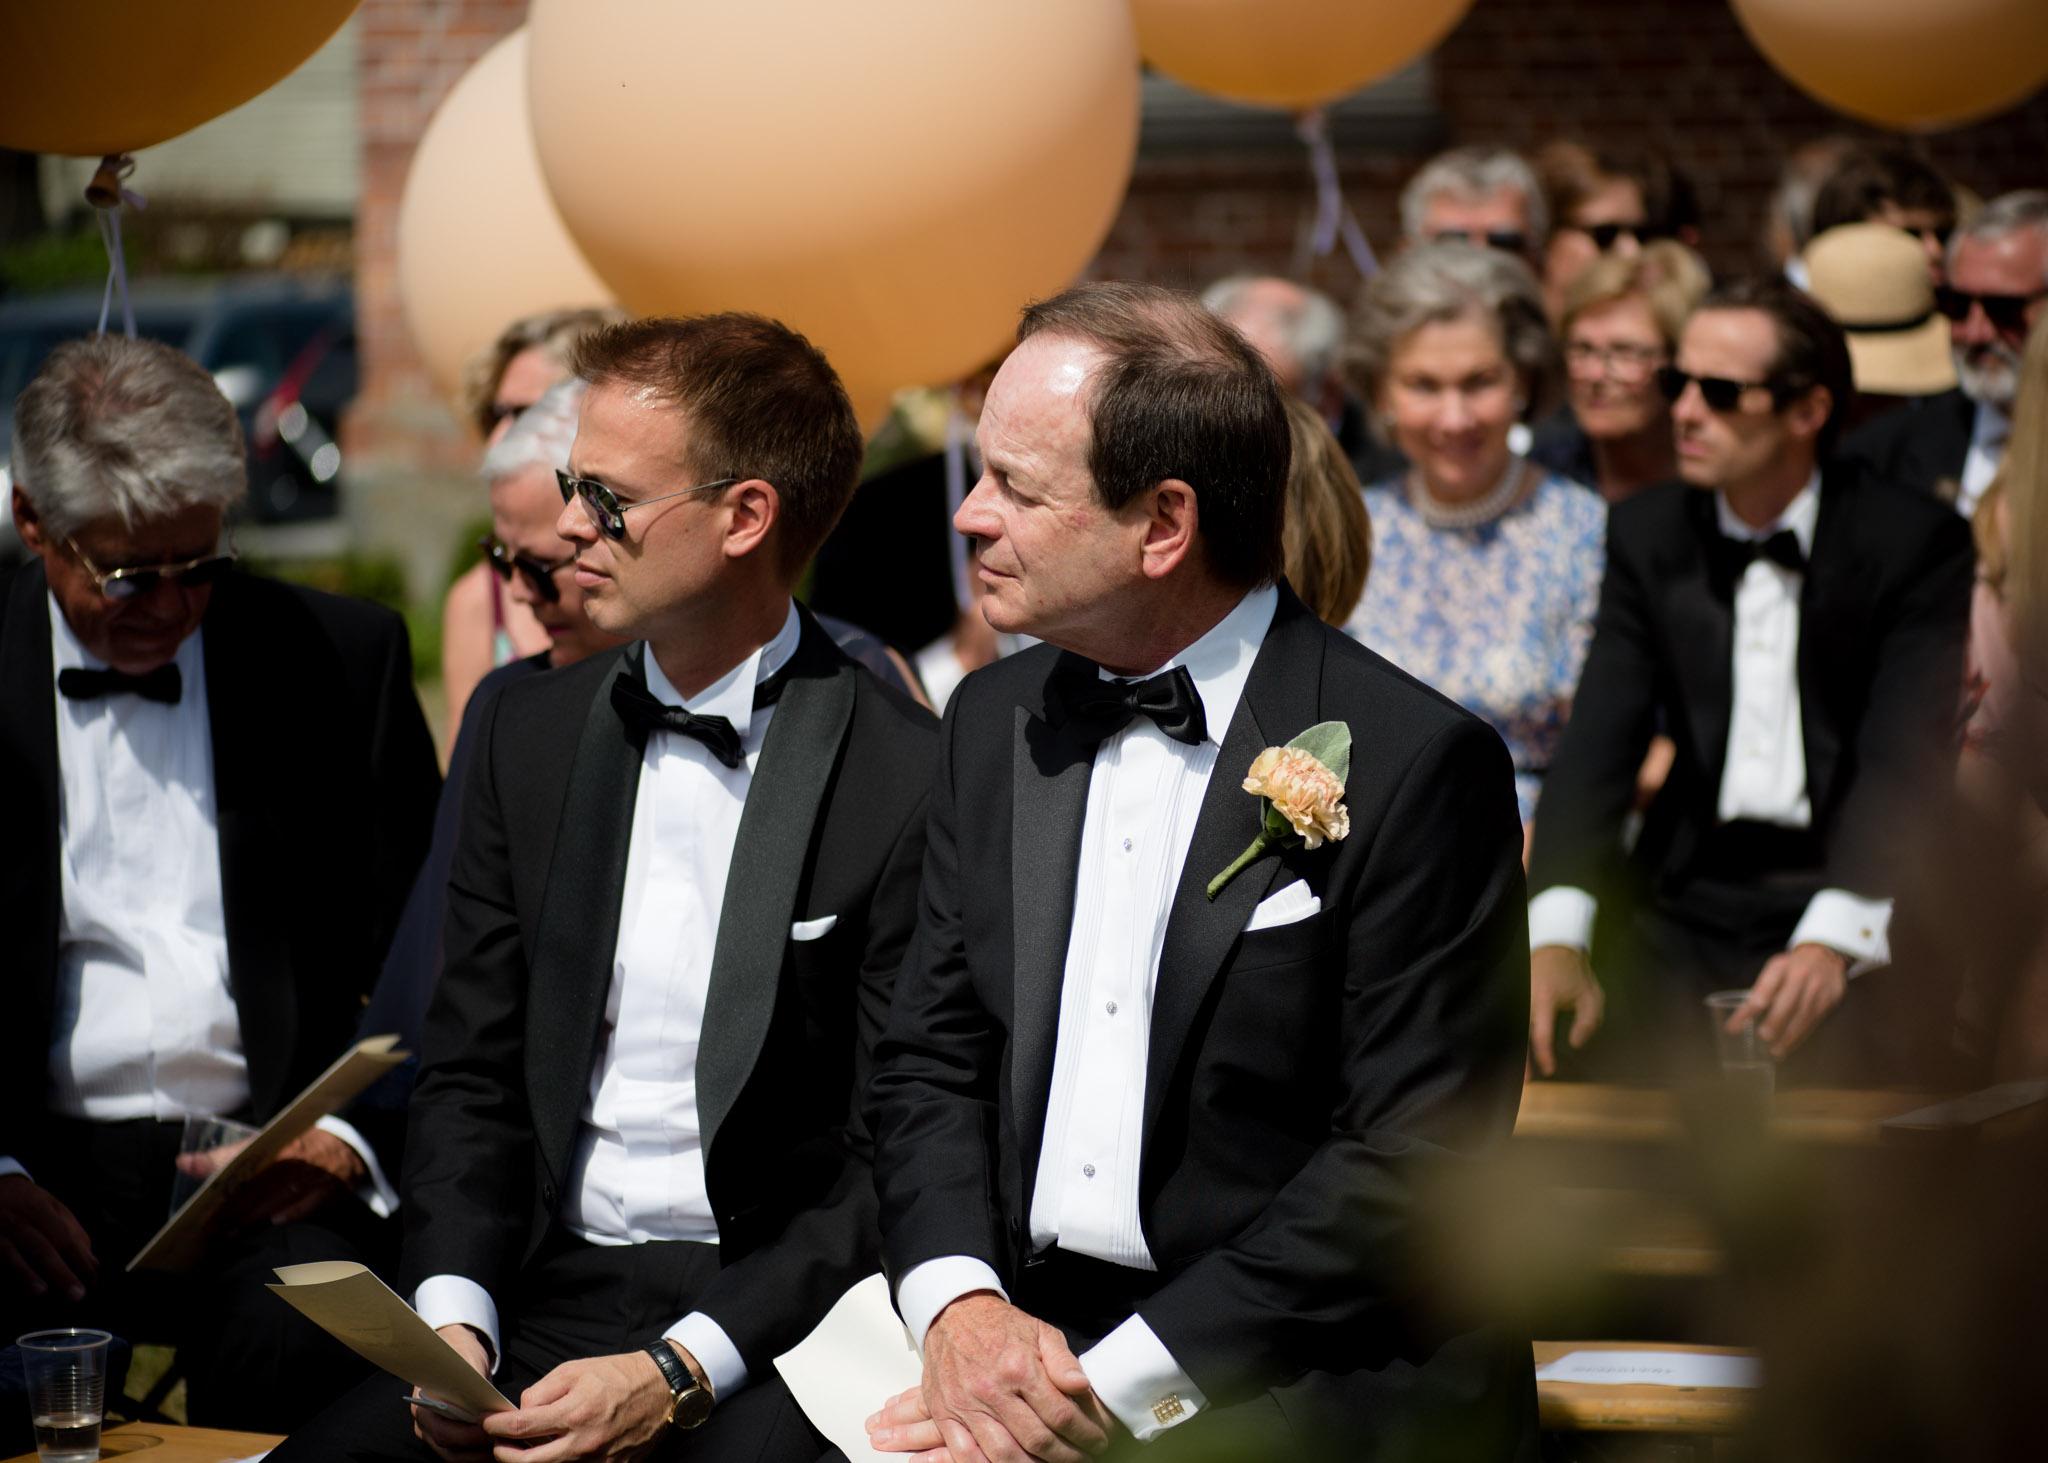 bryllupsfotograf-tønsberg-nøtterøy-fotograf-tjøme-vestfold-oslo-fotografvarpe--2880.JPG